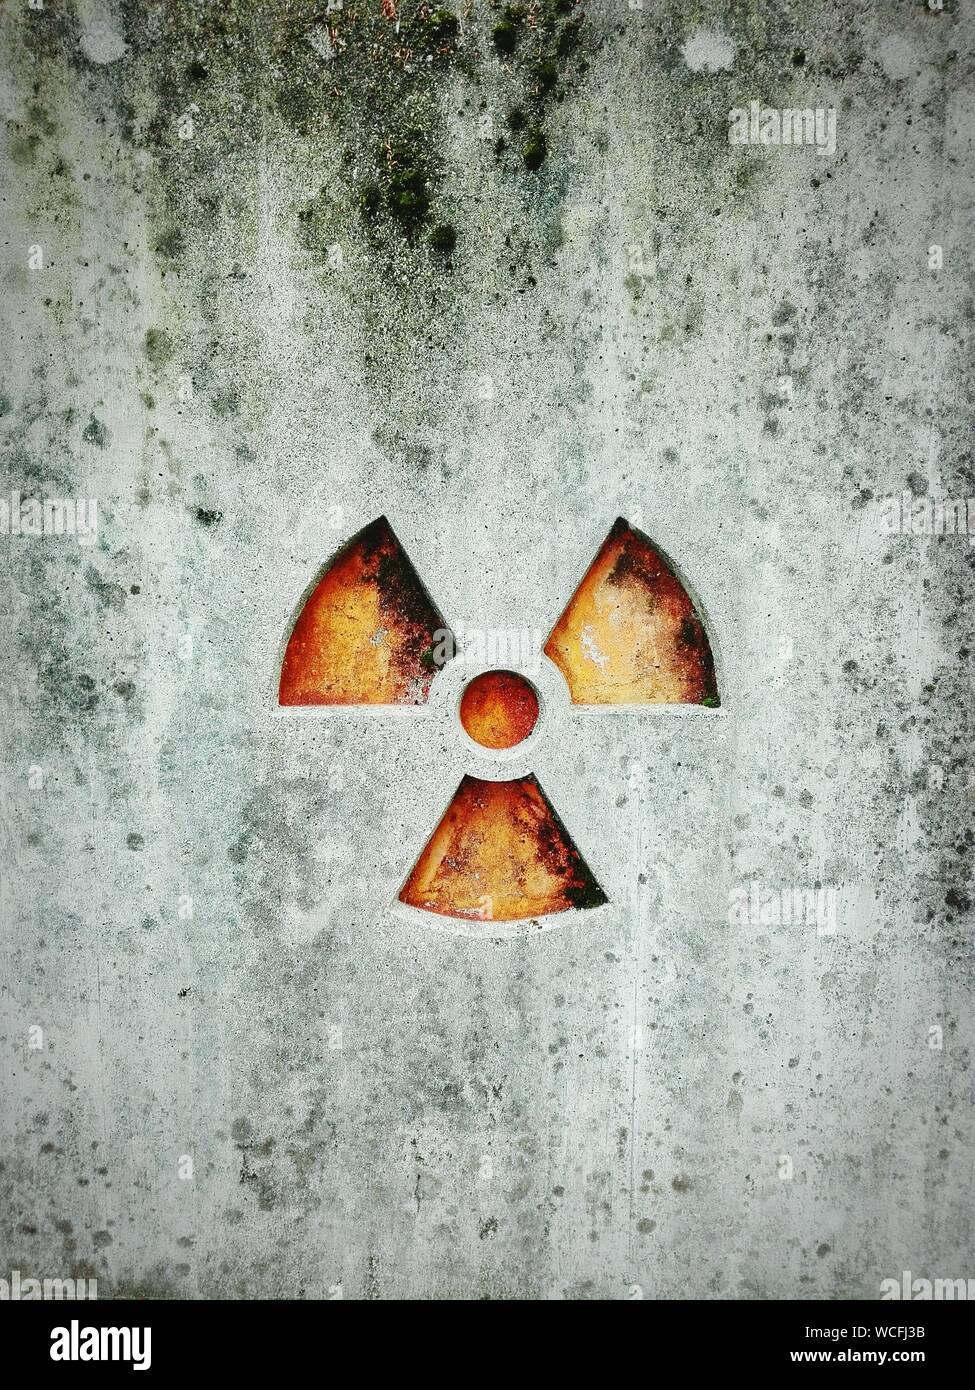 Radioactive Warning Symbol On Wall Stock Photo